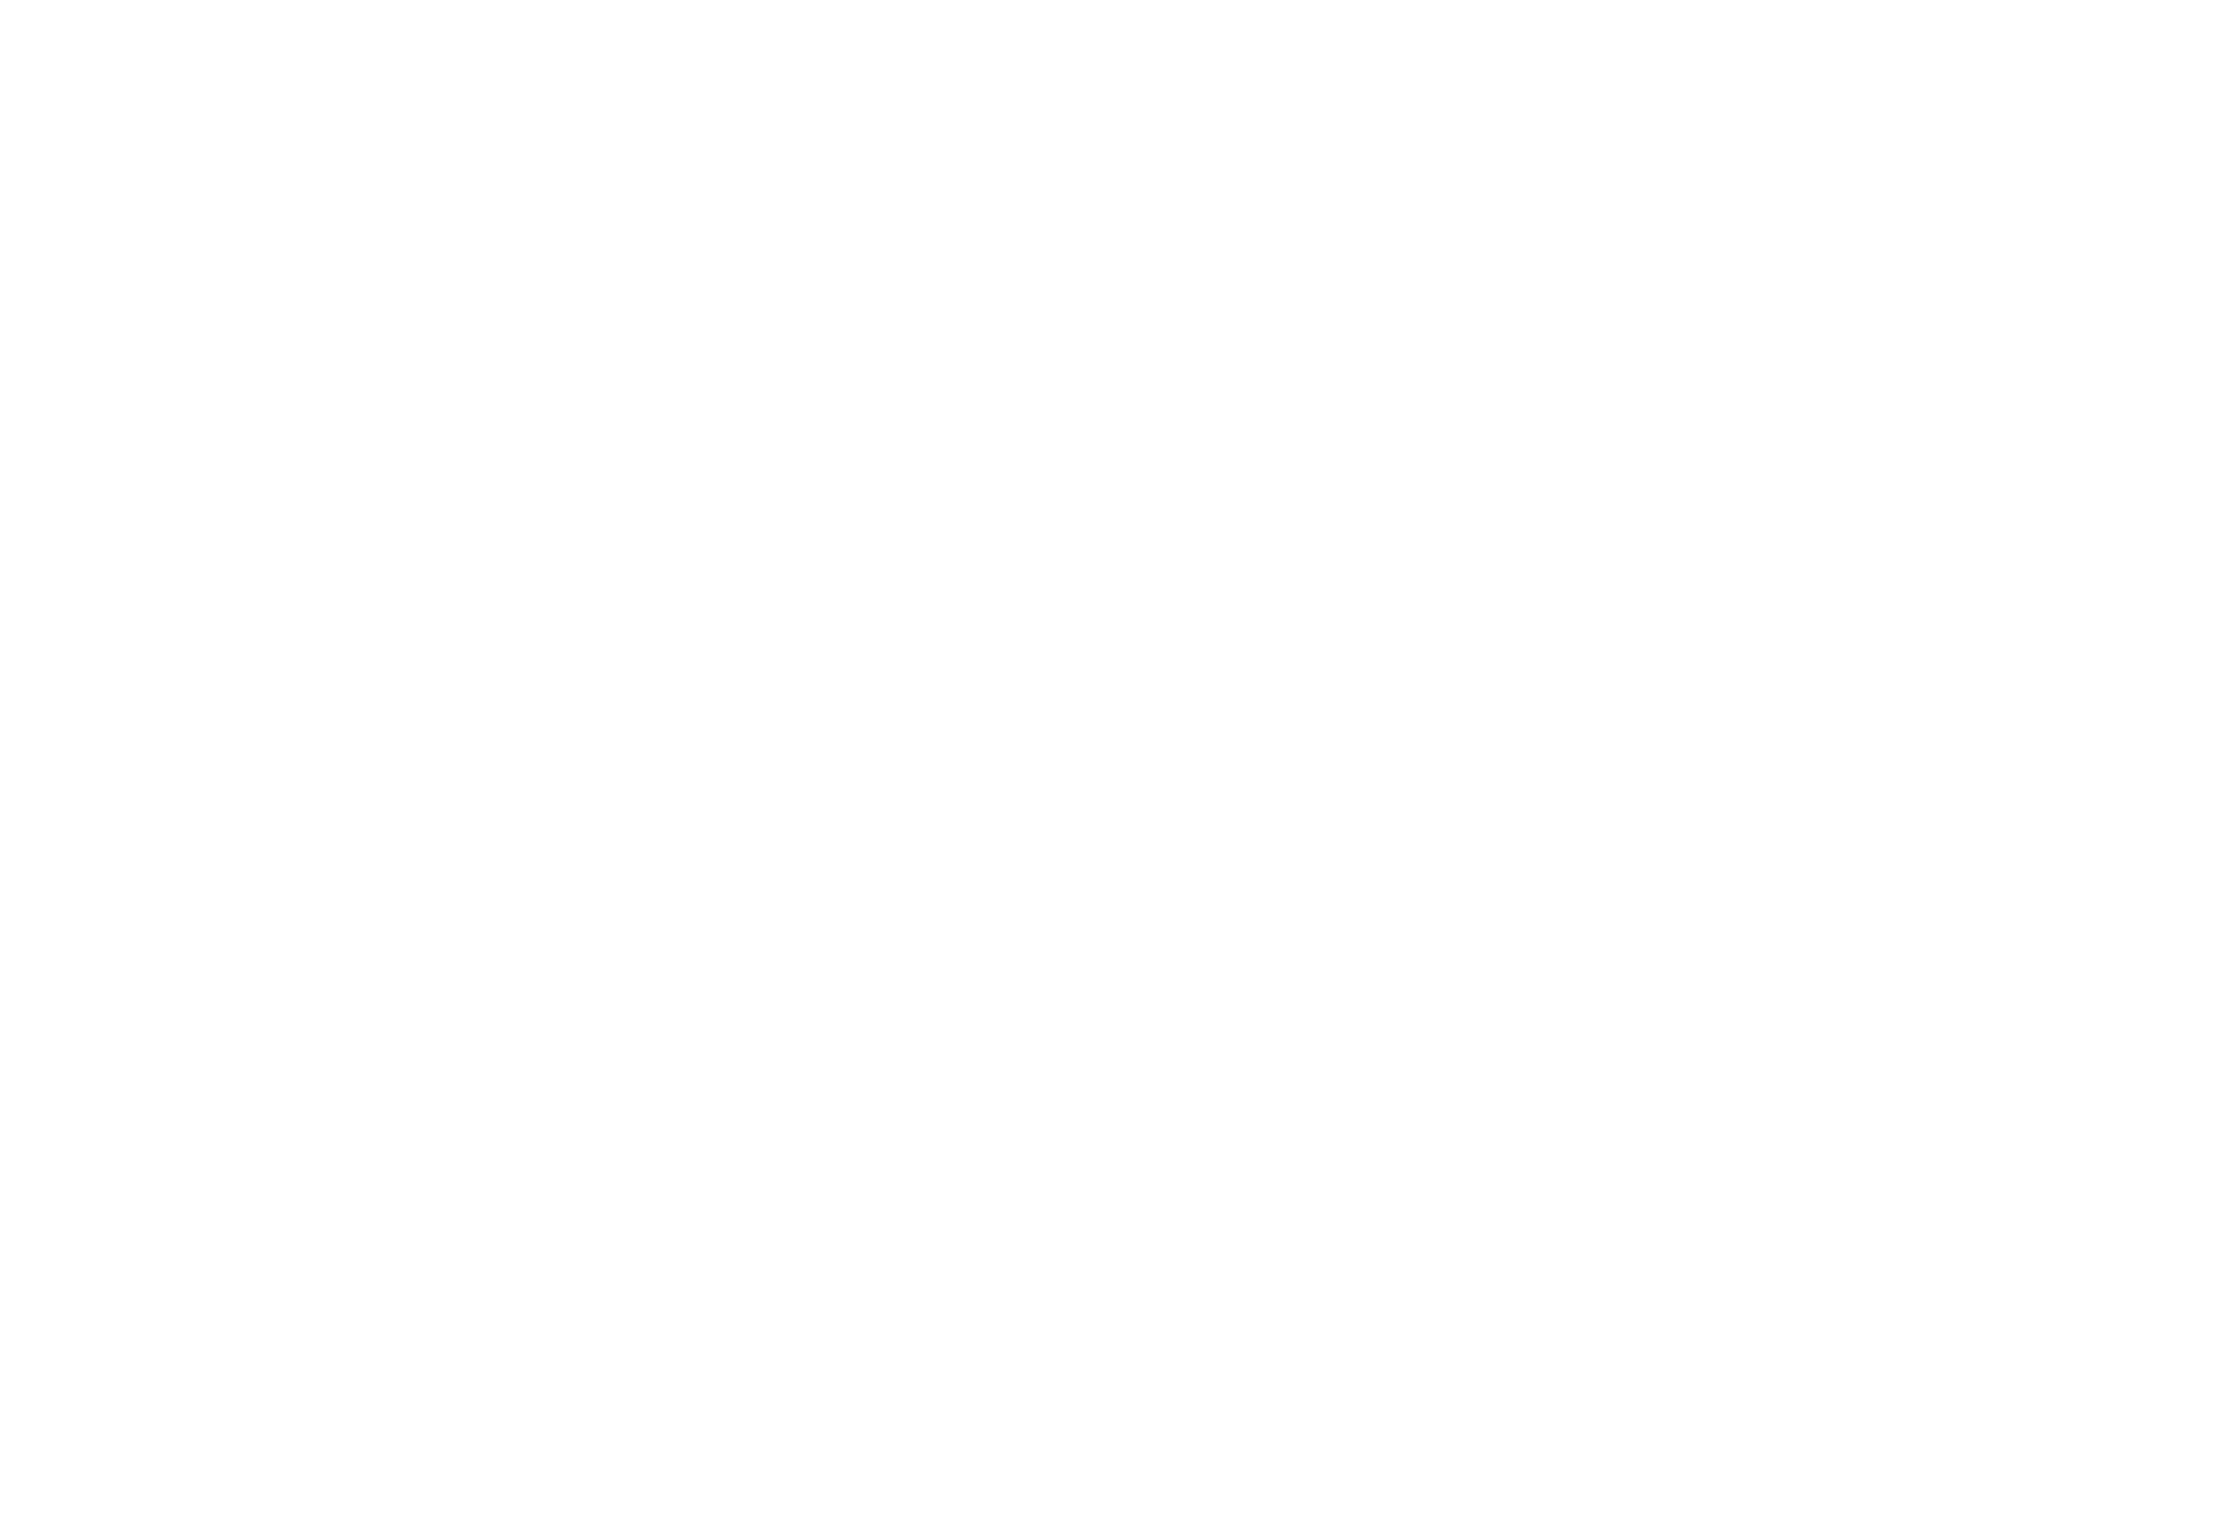 moritz-hamberger_slackline-skifahren-design_Moritz Hamberger Logo gerade_mh_logo_white